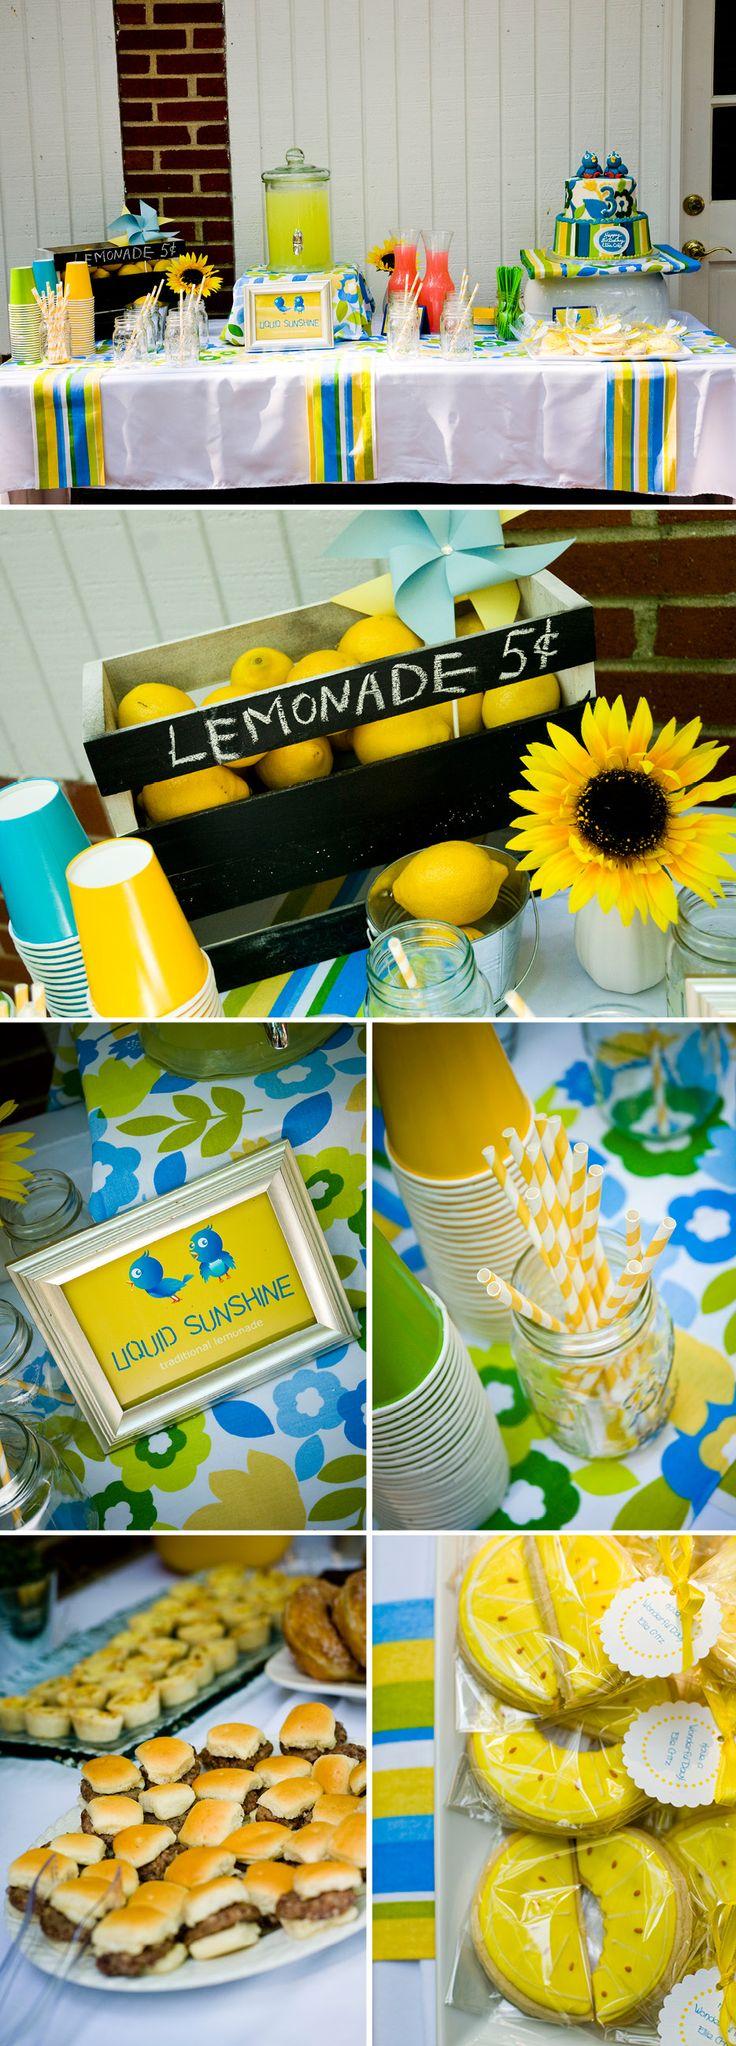 "Bright and Playful ""Zippity-Doo-Dah"" Inspired Birthday Party - The Celebration Society"